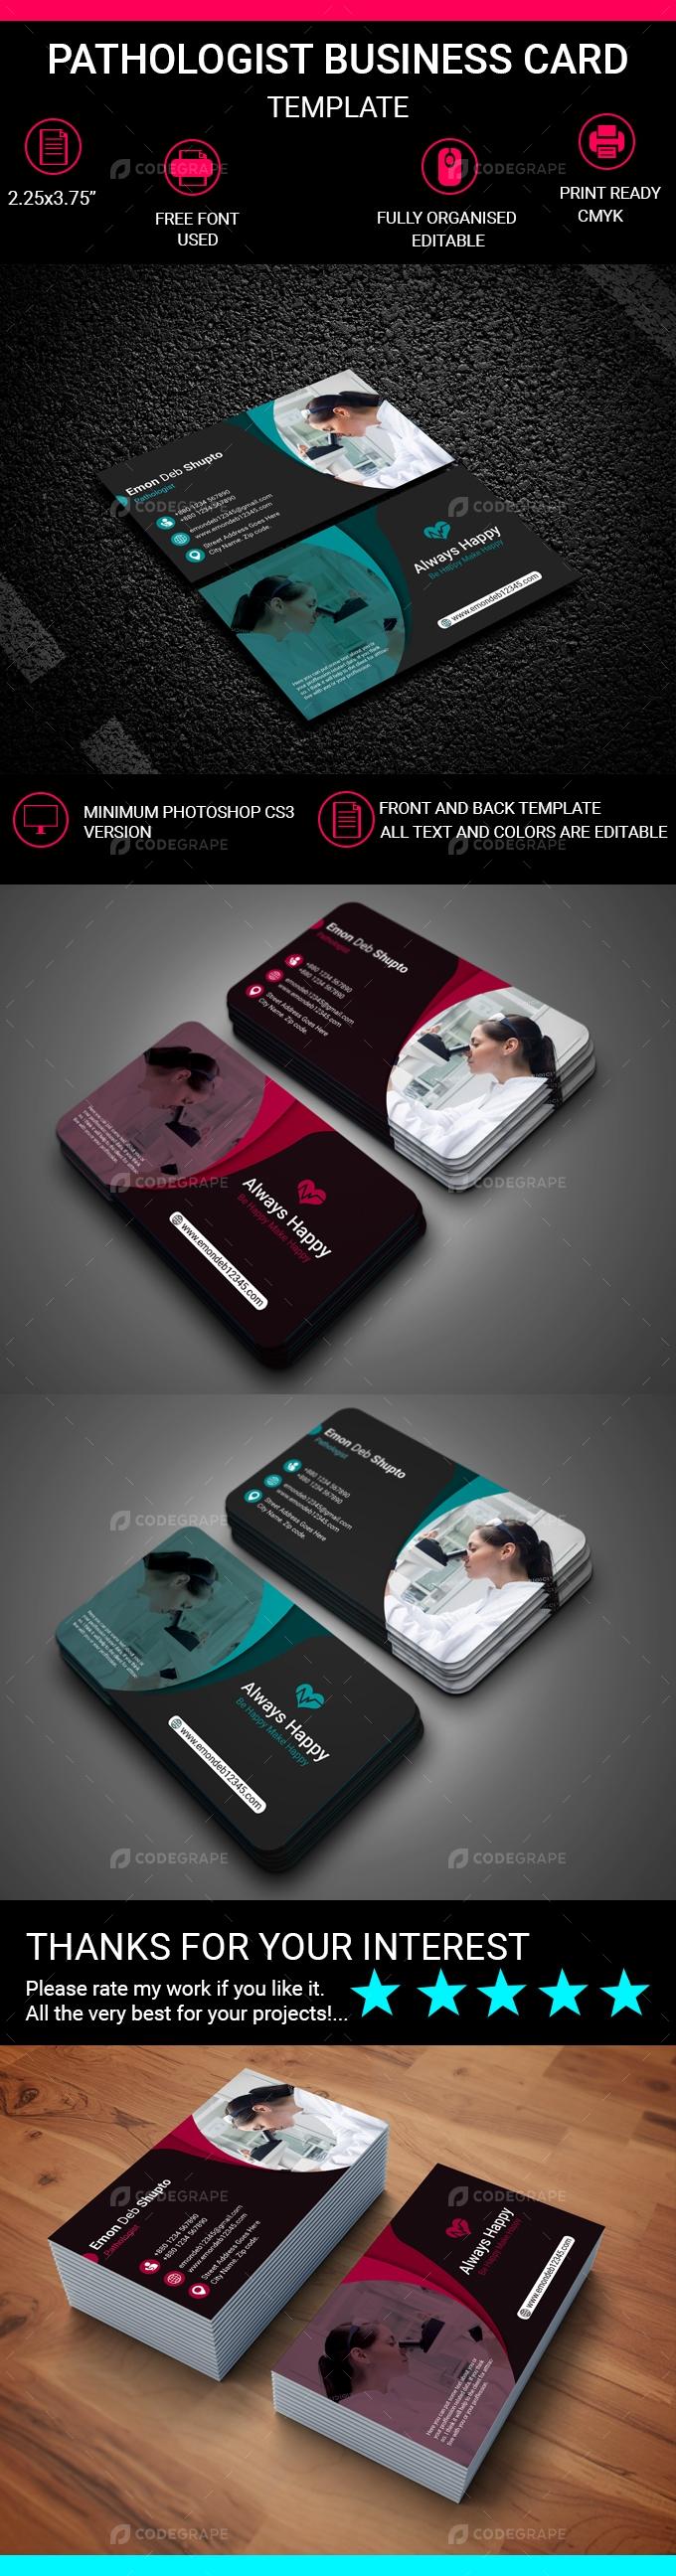 Pathologist Business Card